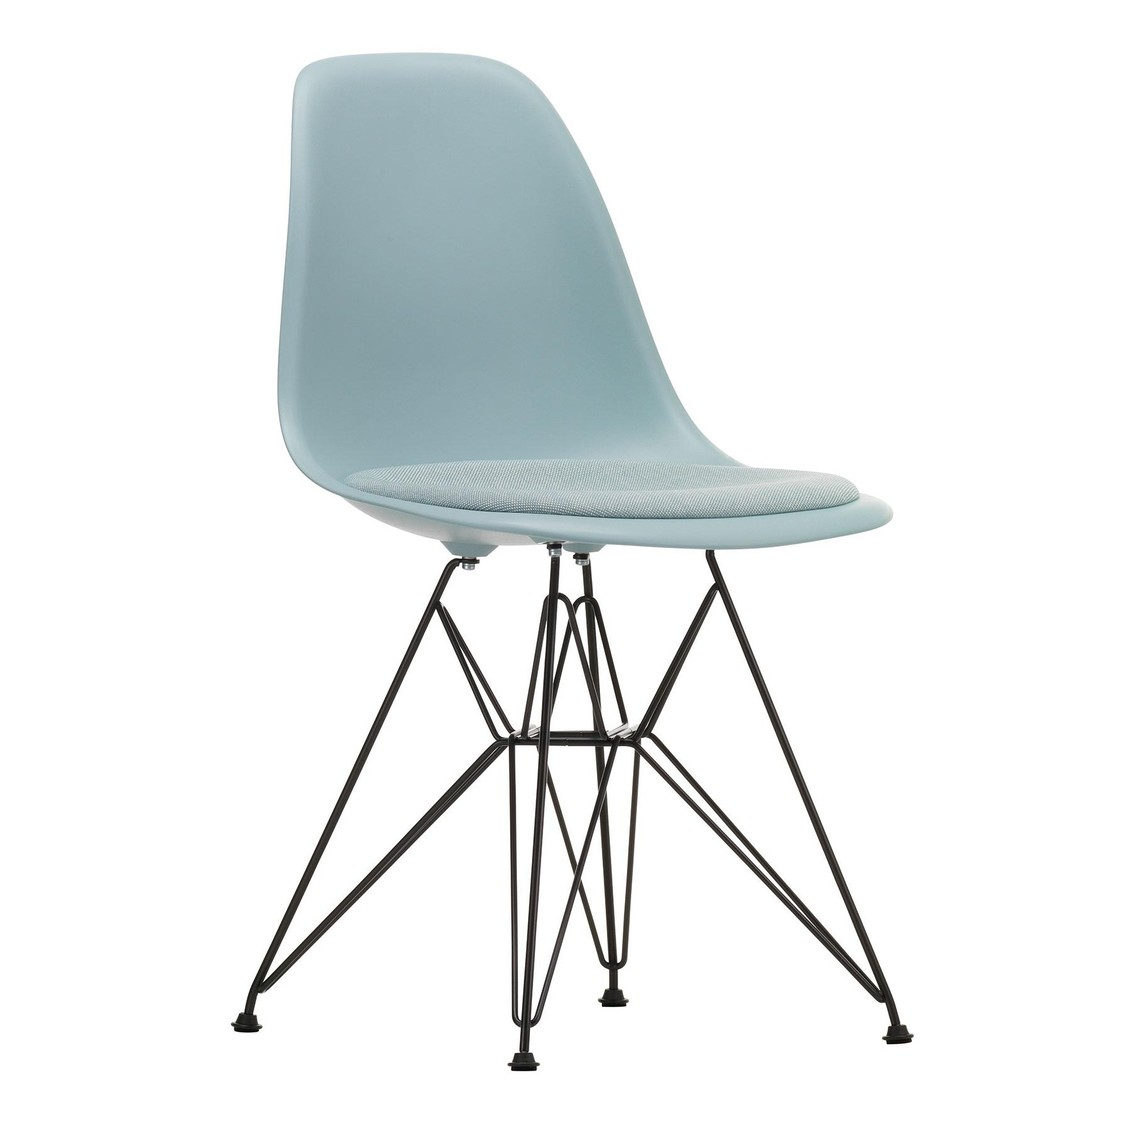 vitra eames plastic side chair dsr gepolstert ambientedirect. Black Bedroom Furniture Sets. Home Design Ideas